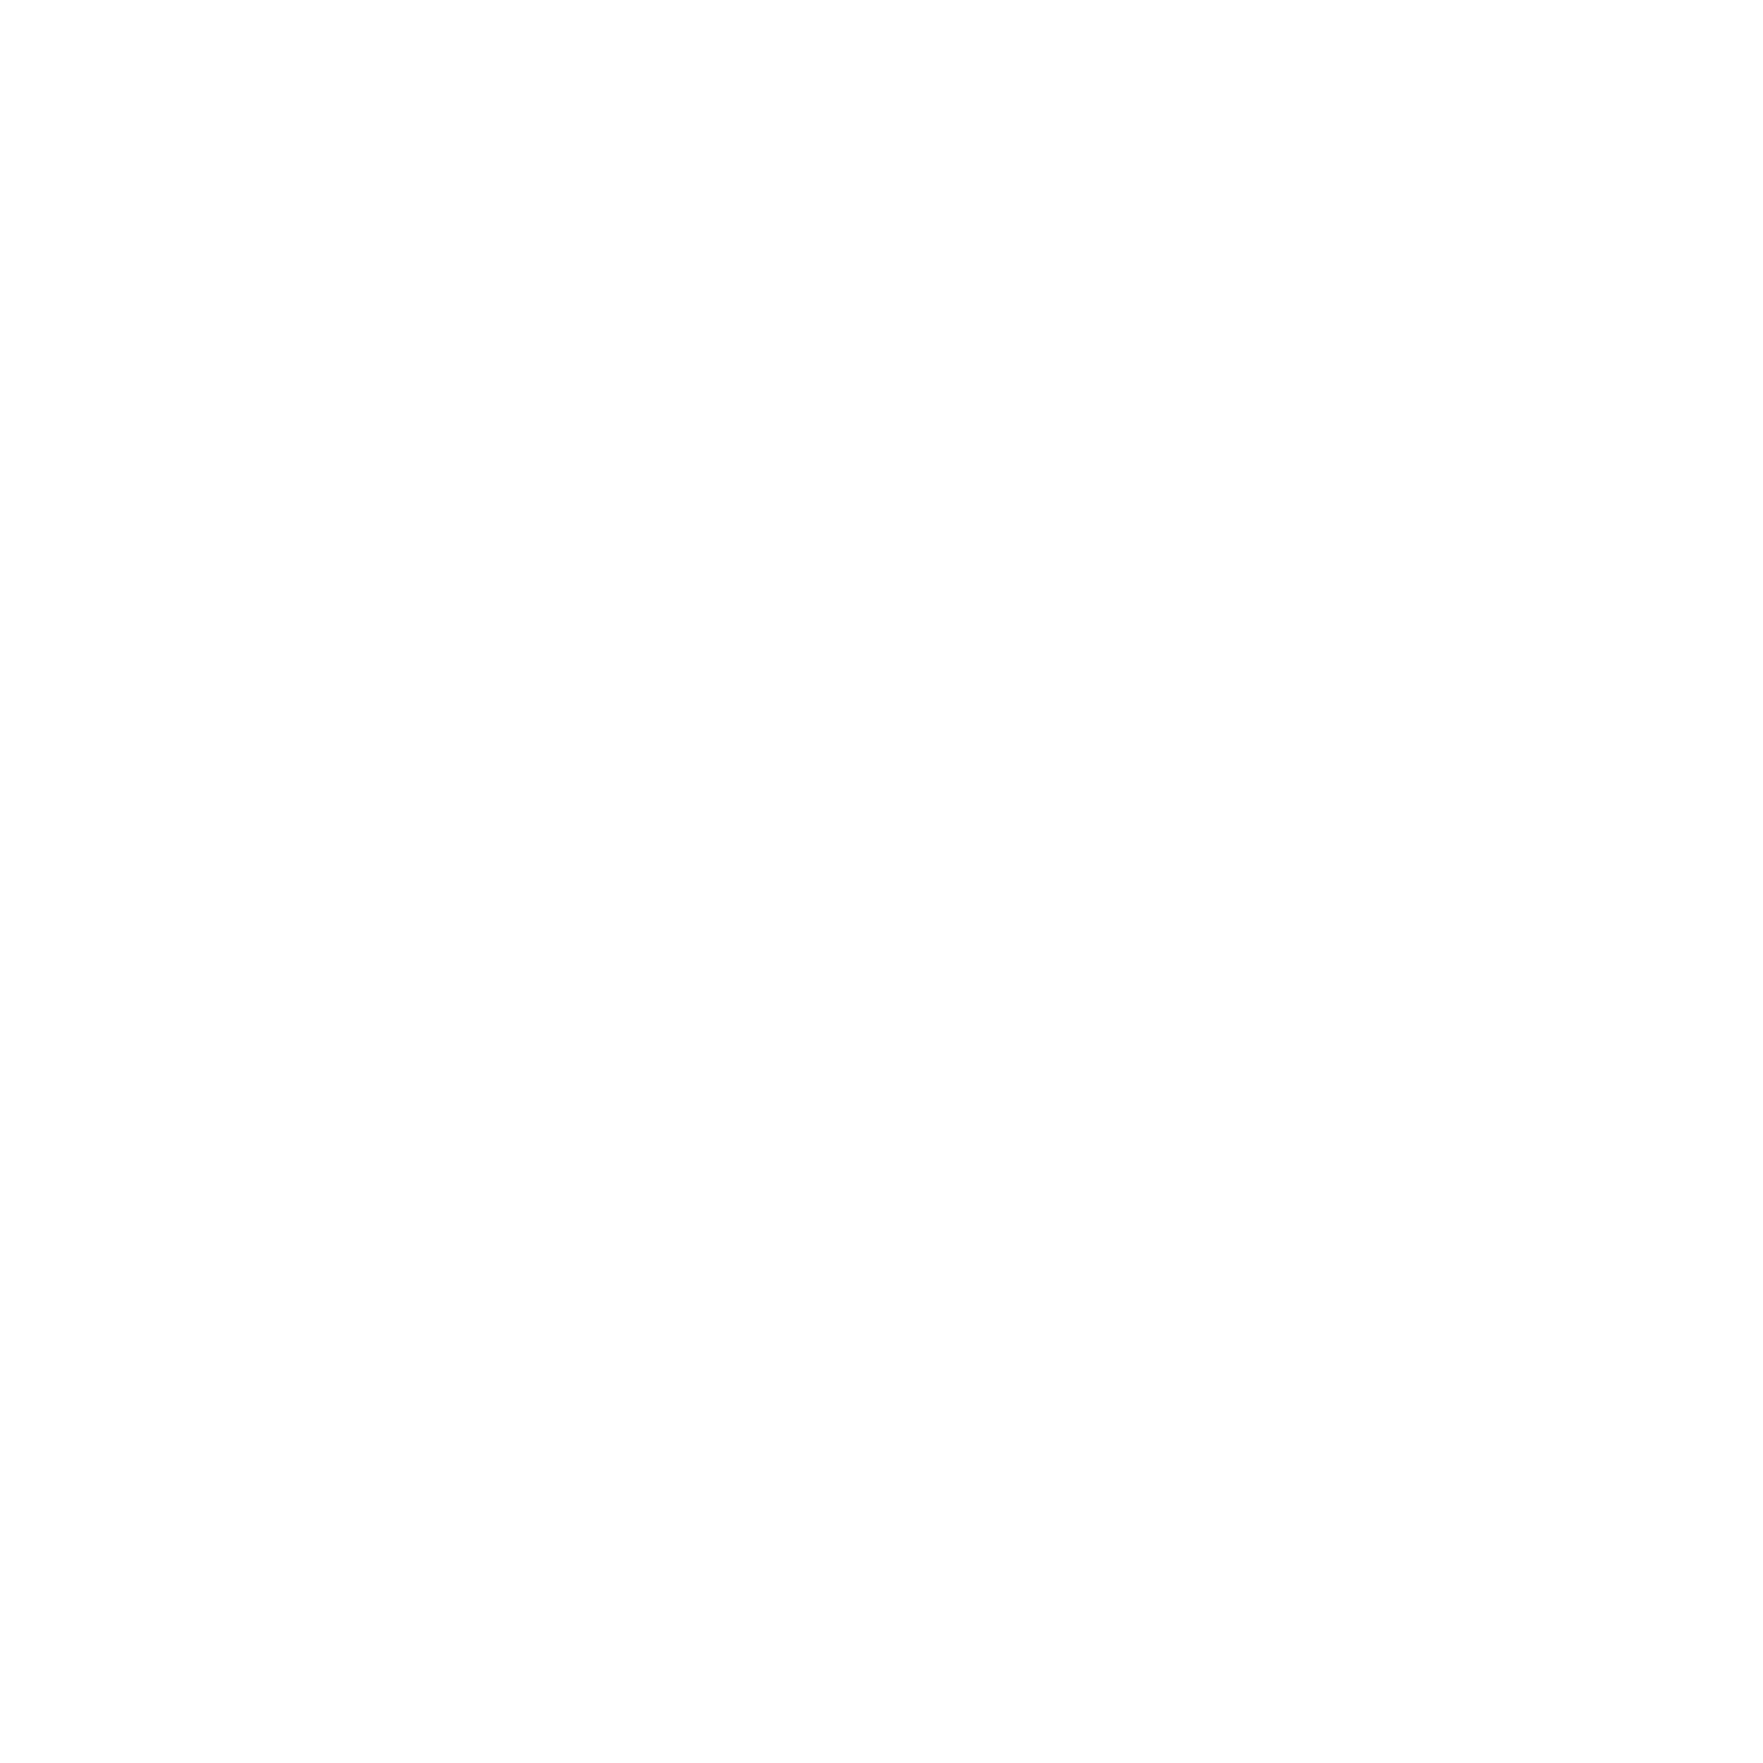 COSTAS PICADAS - QUARK TUNNELING_000054.jpg